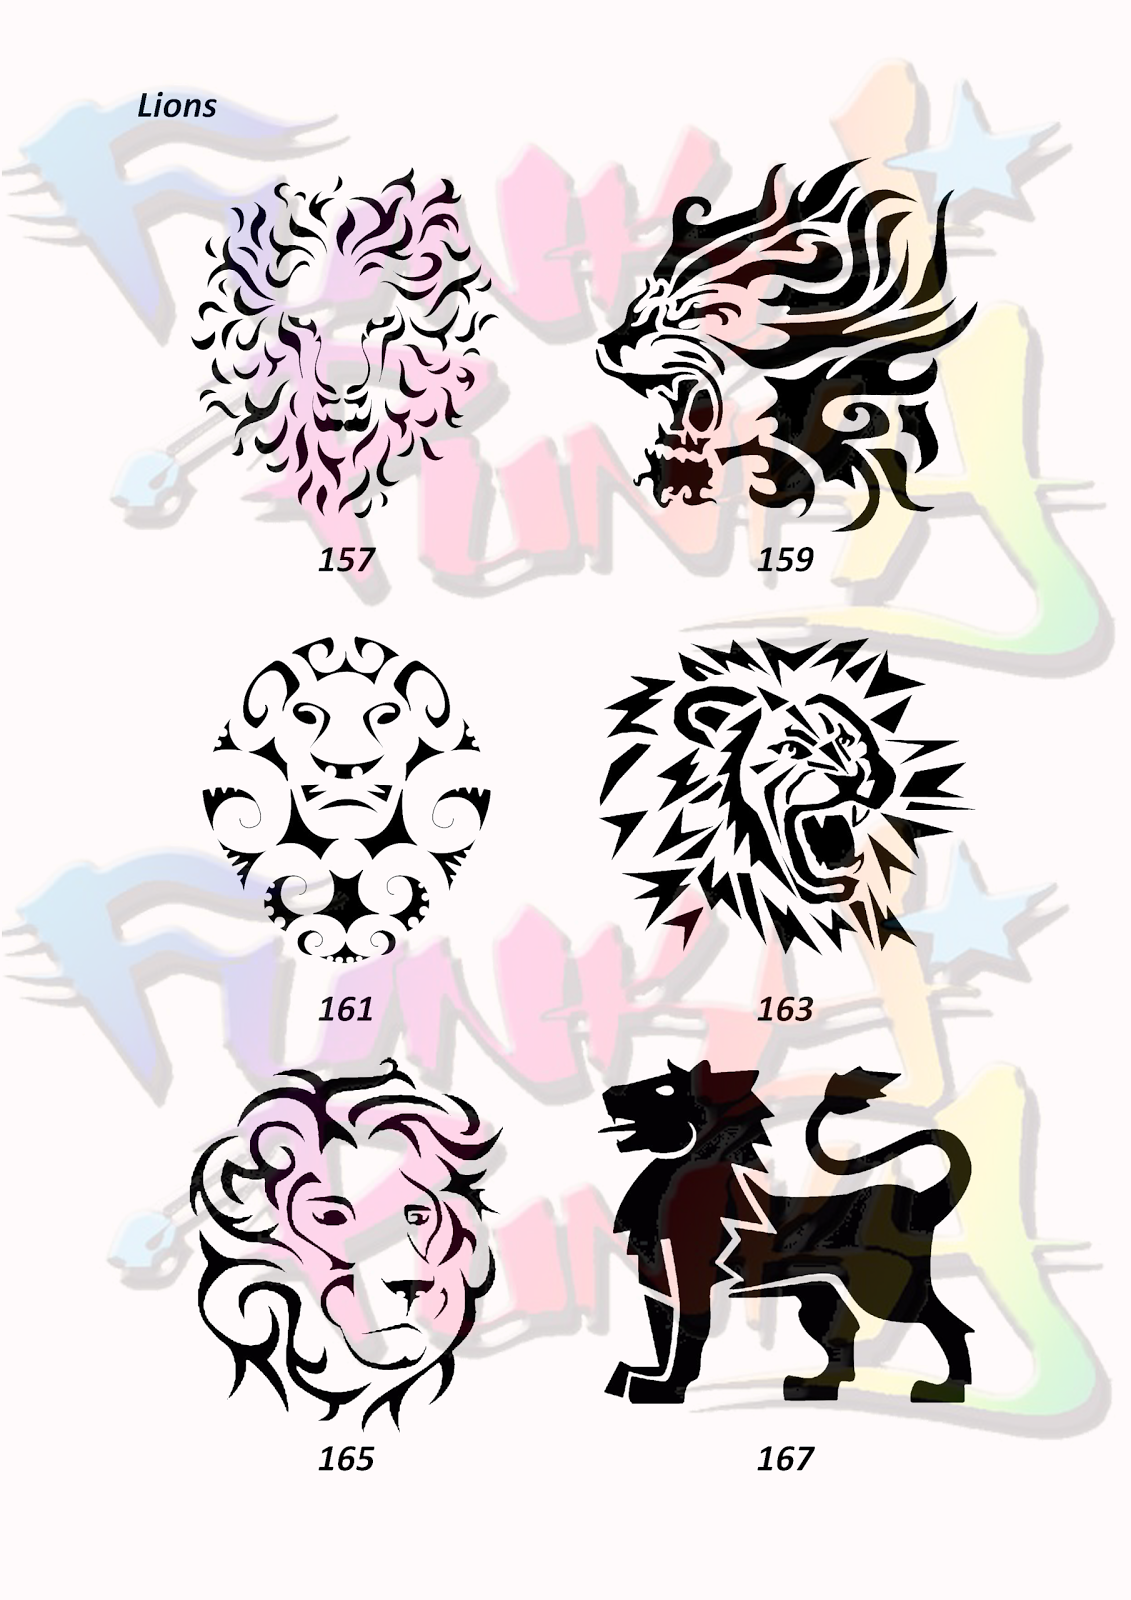 Rasta lion head stencil - photo#9